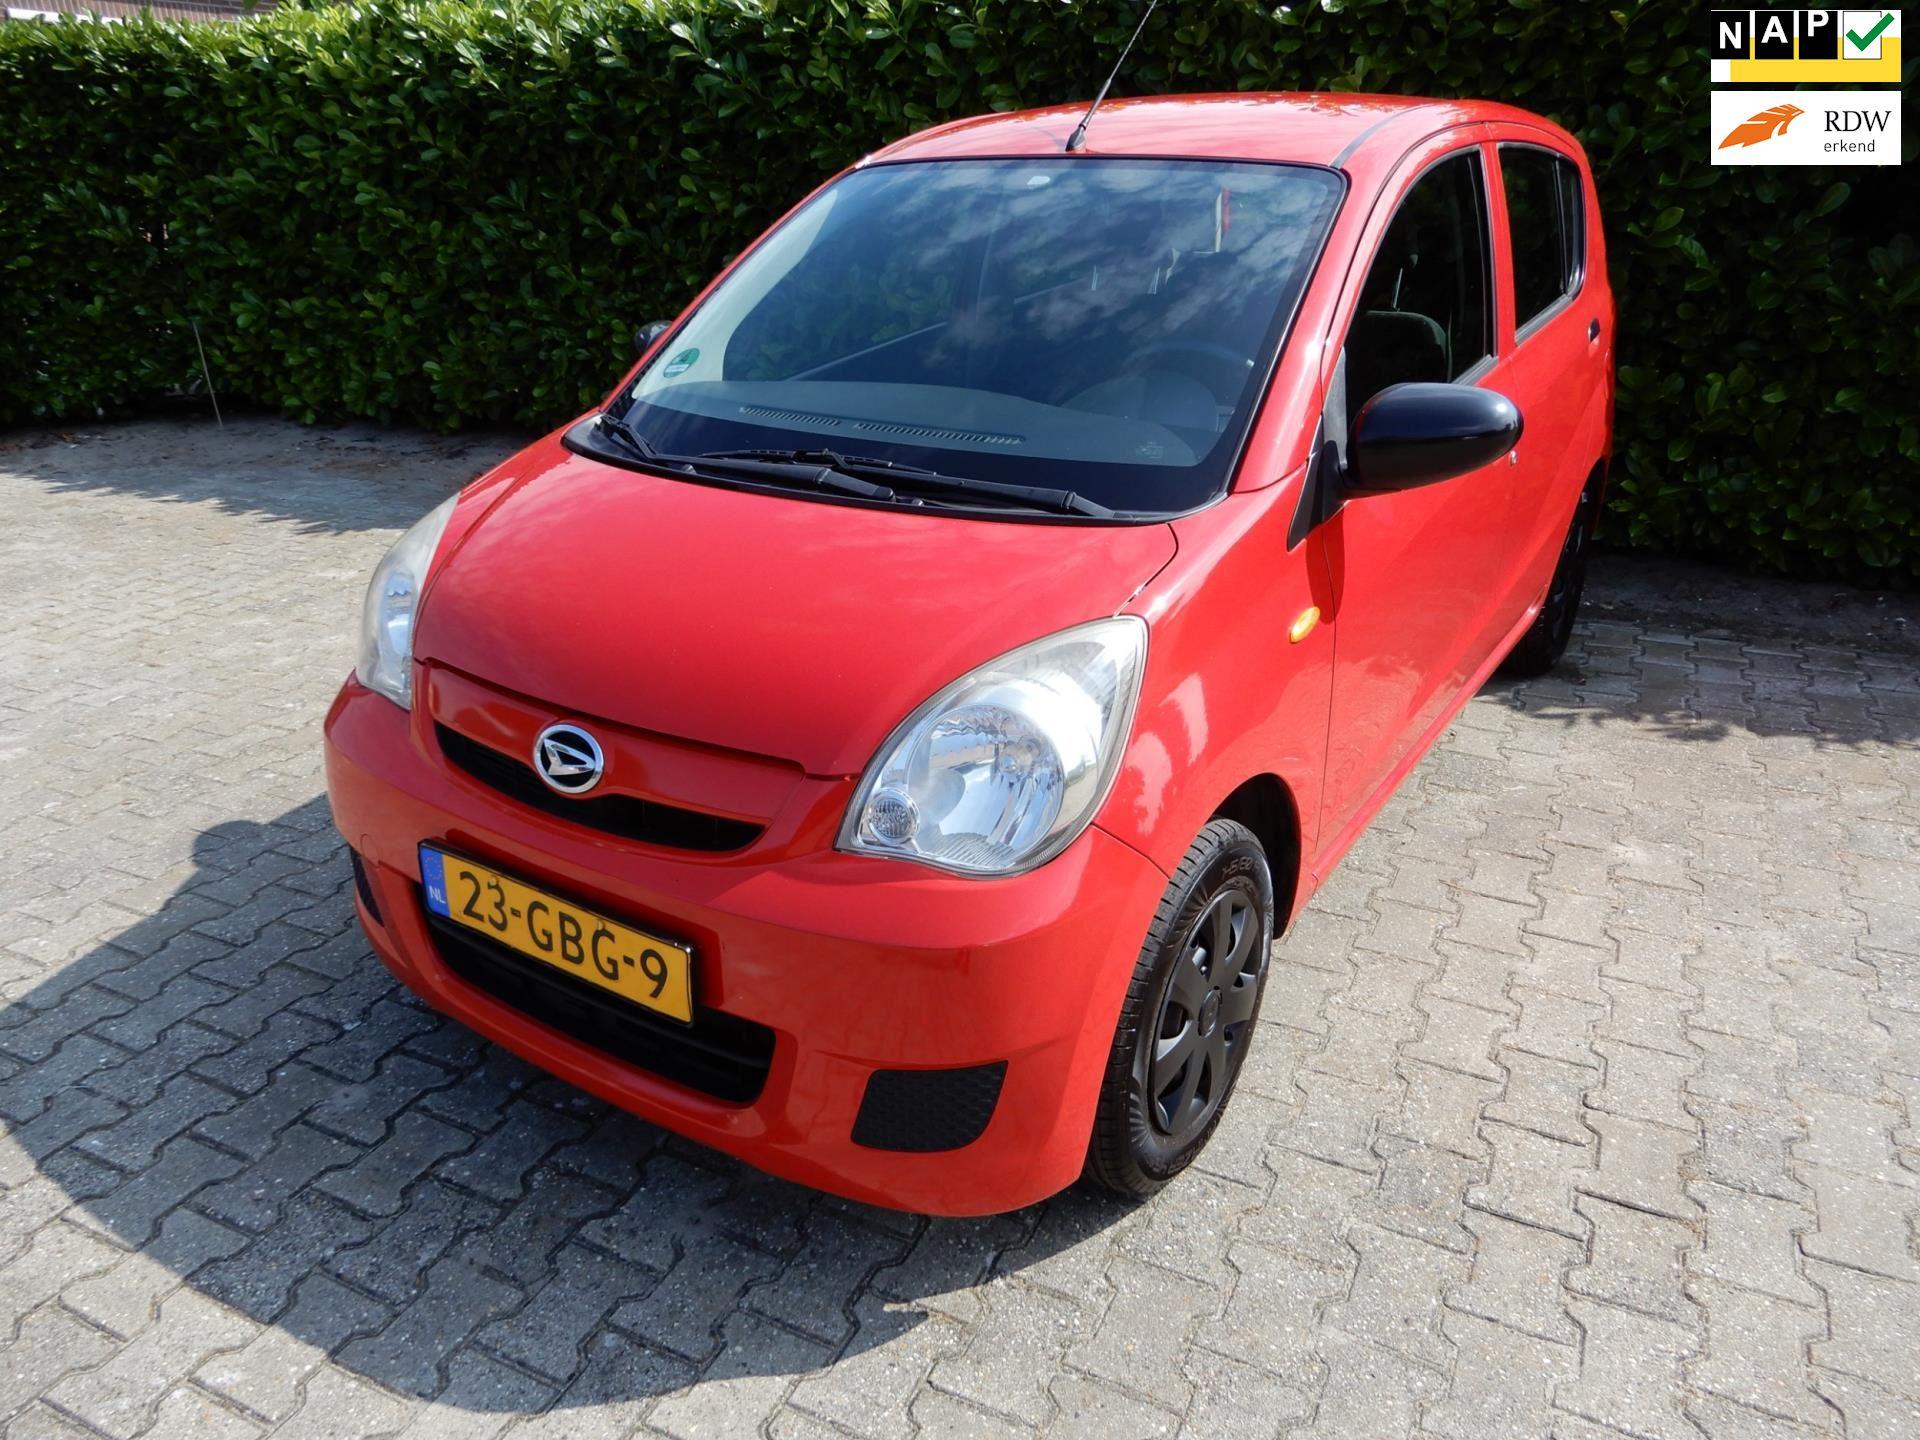 Daihatsu Cuore occasion - Autobedrijf Nieuwbroek